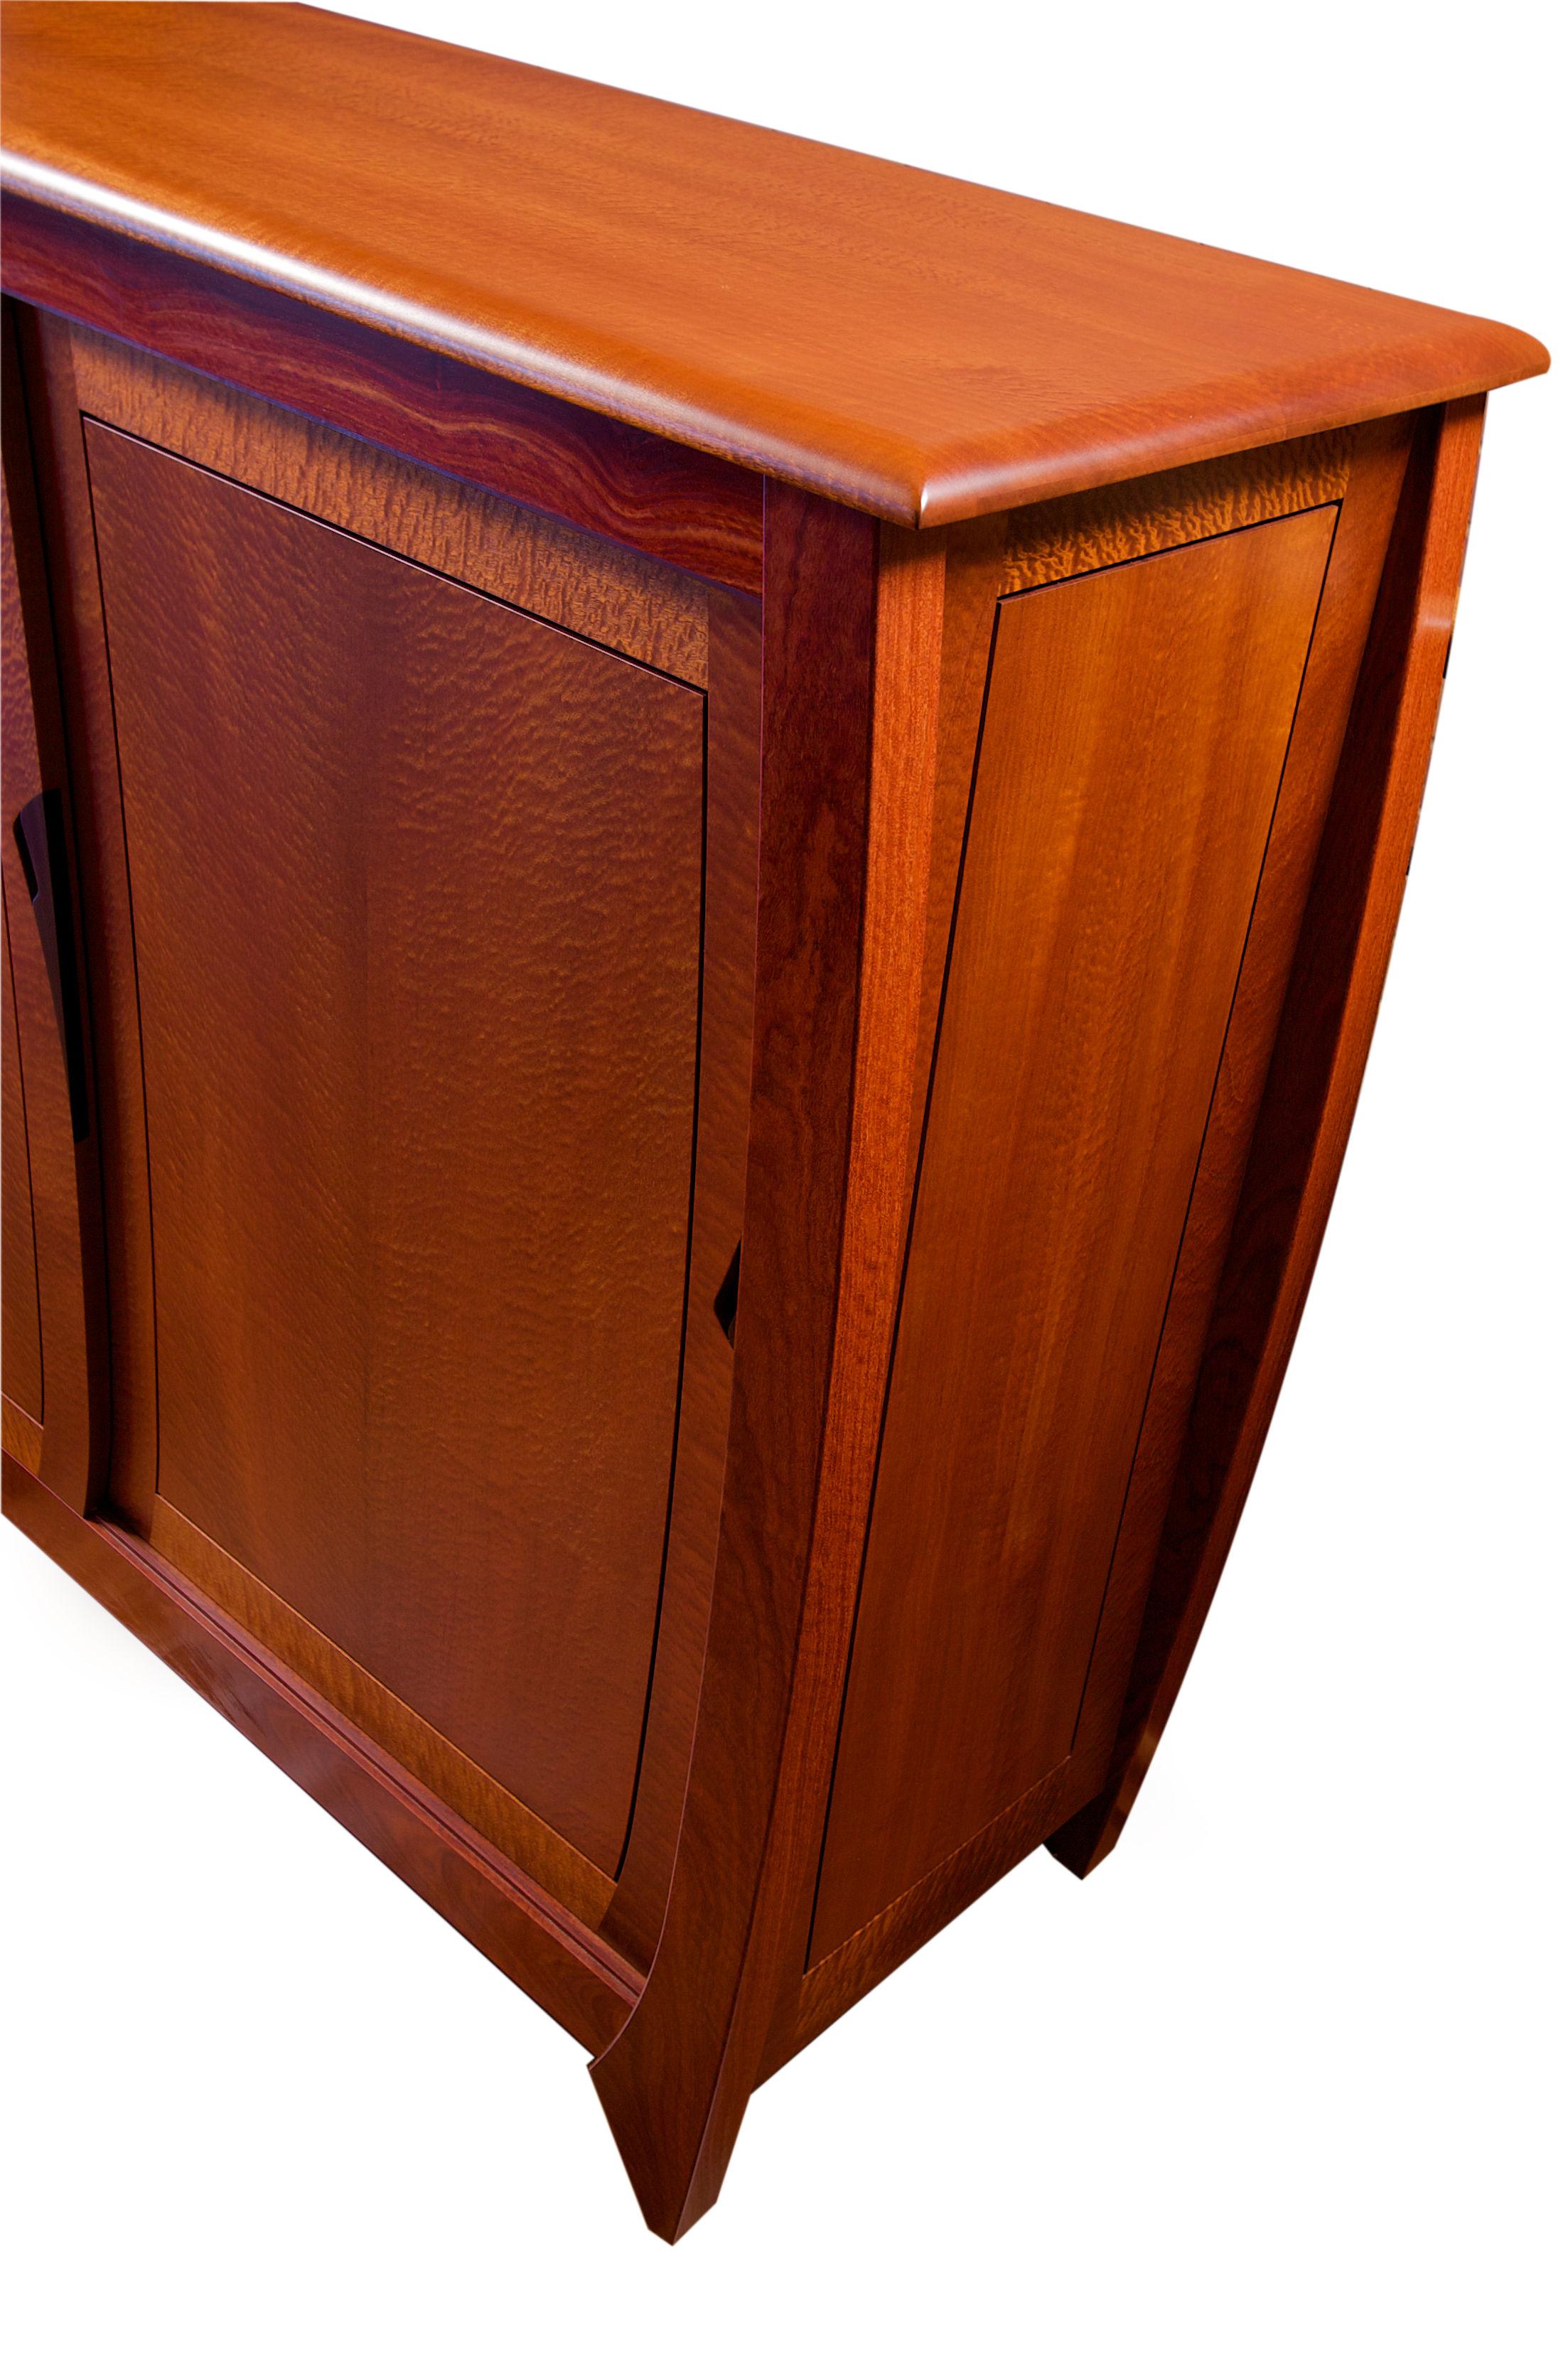 Custom Handmade Solid Timber Orb Style Cabinet